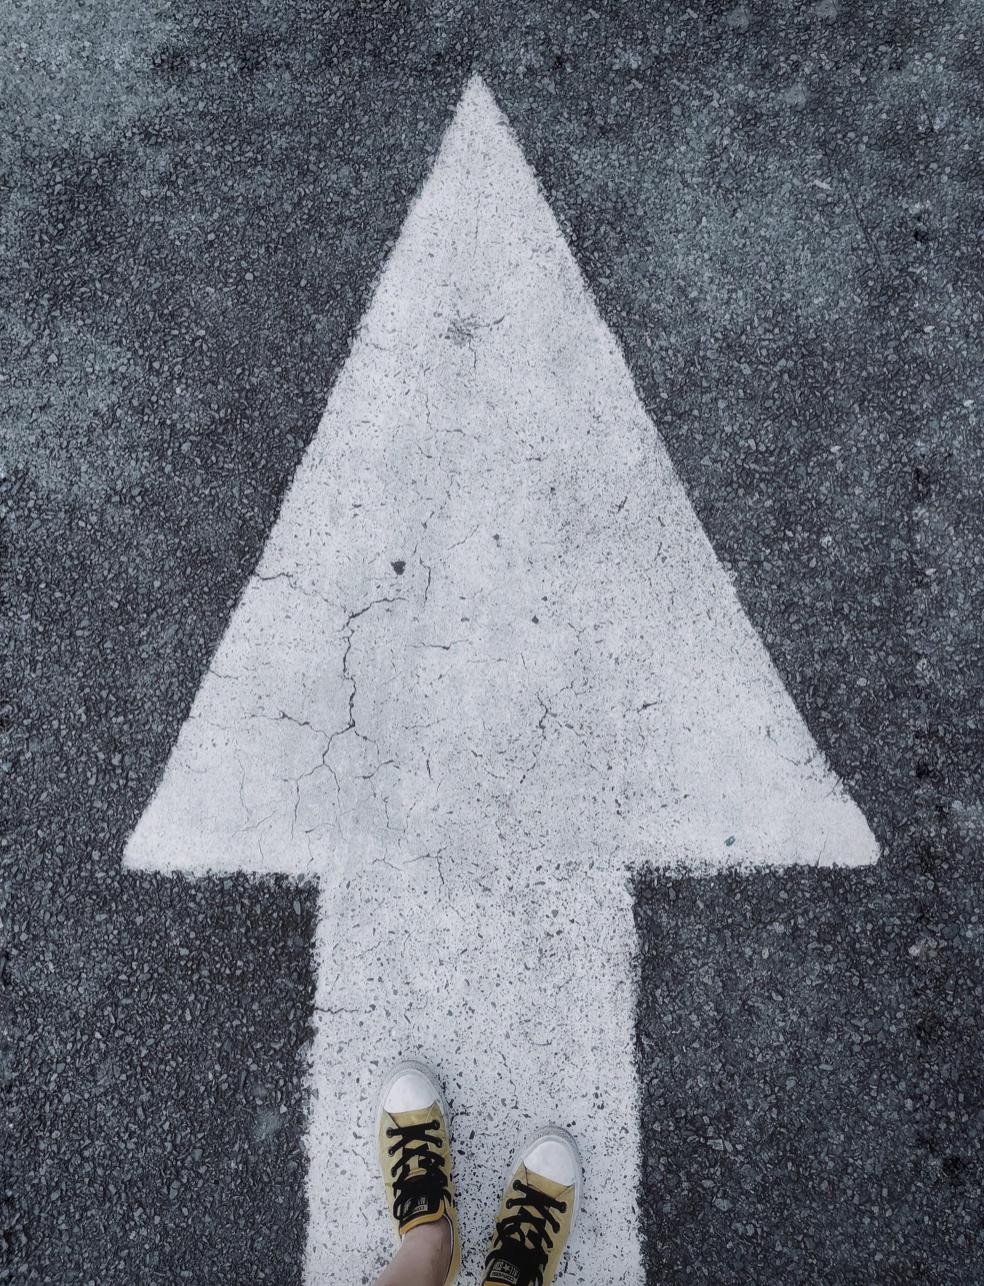 Direction, forward, feet on arrow, onwards, decisions, choosing life